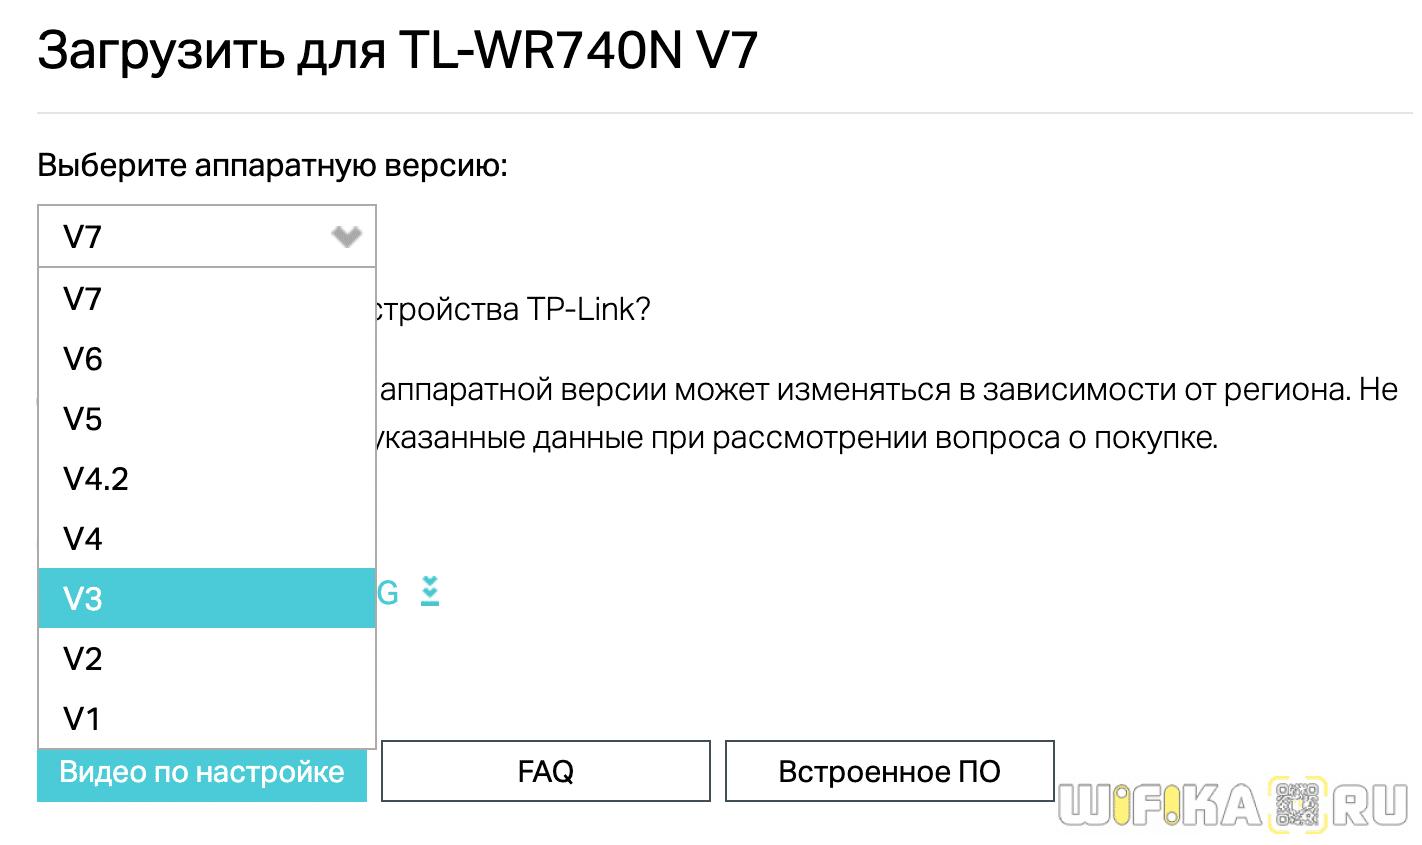 аппаратная версия роутера tp-link